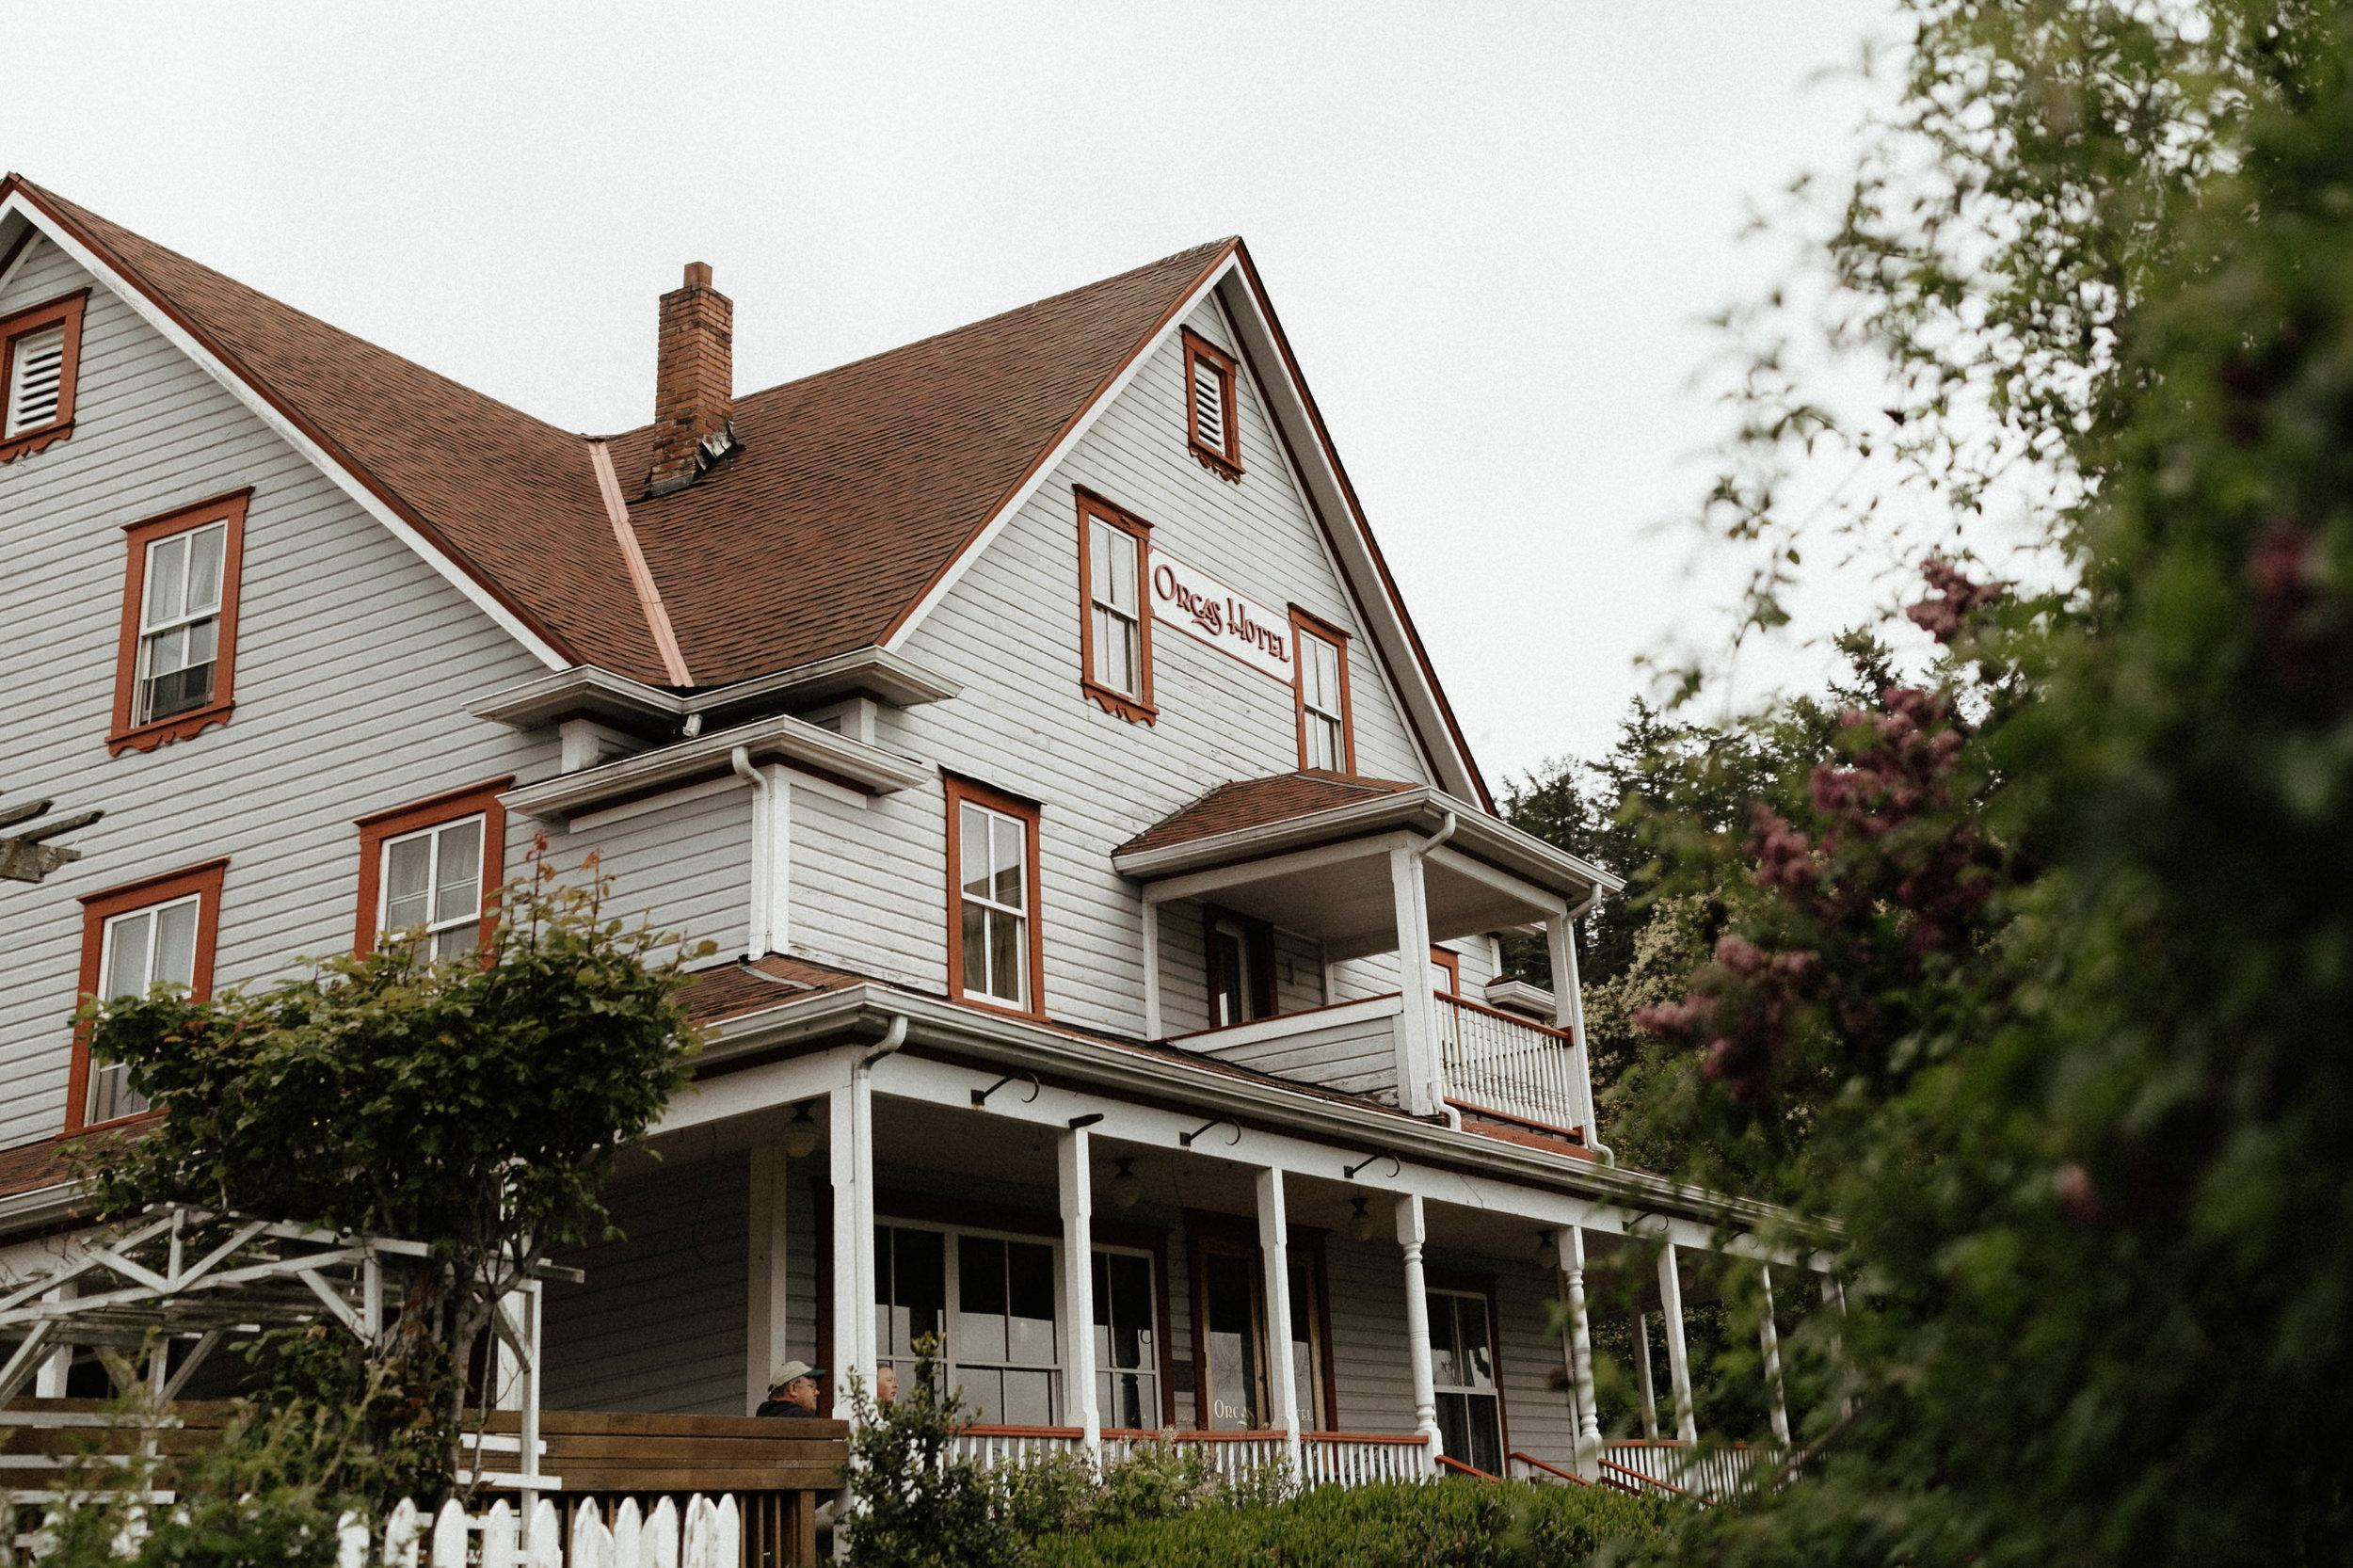 Orcas Hotel Wedding Venue - Orcas Island, Washington - Portland Oregon Wedding and Elopement Photographer